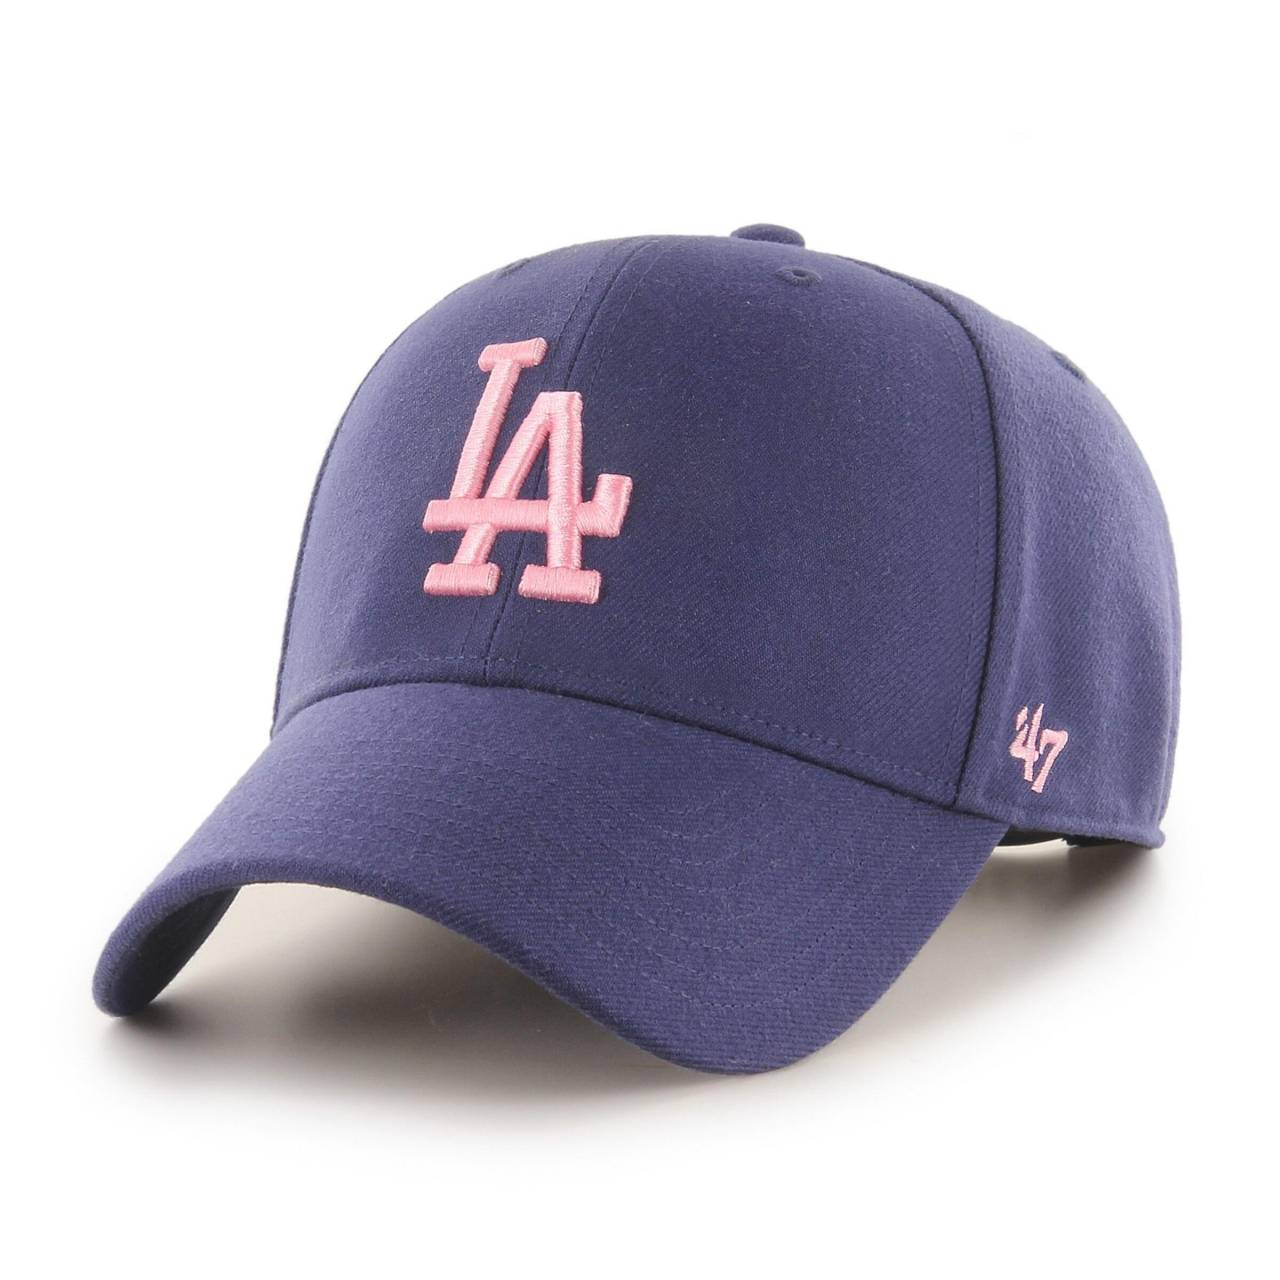 MLB LOS ANGELES DODGERS '47 MVP SNAPBACK NAVY